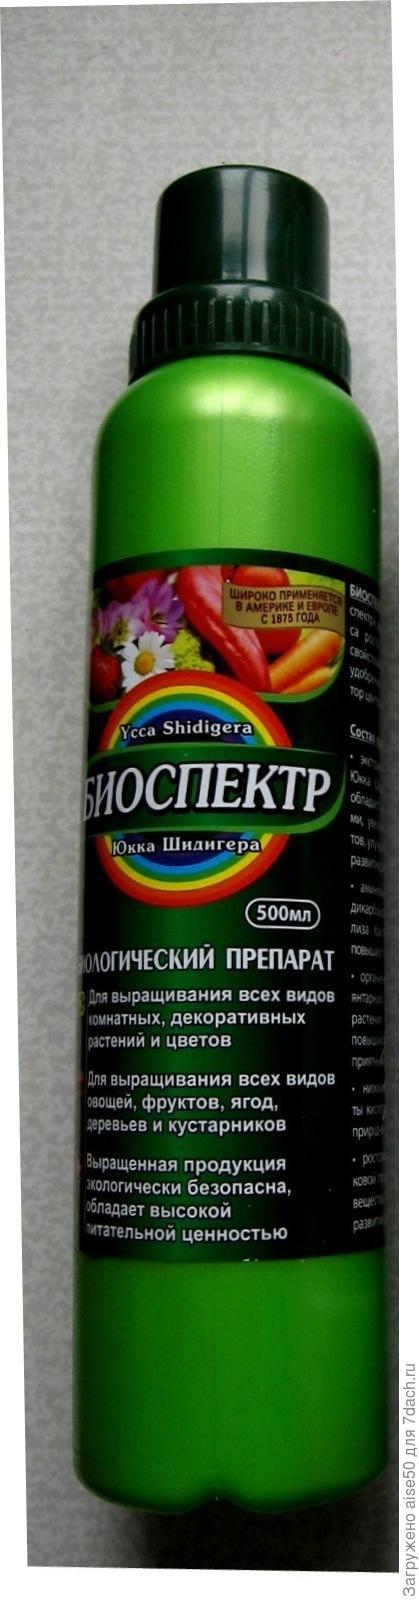 биоспектр